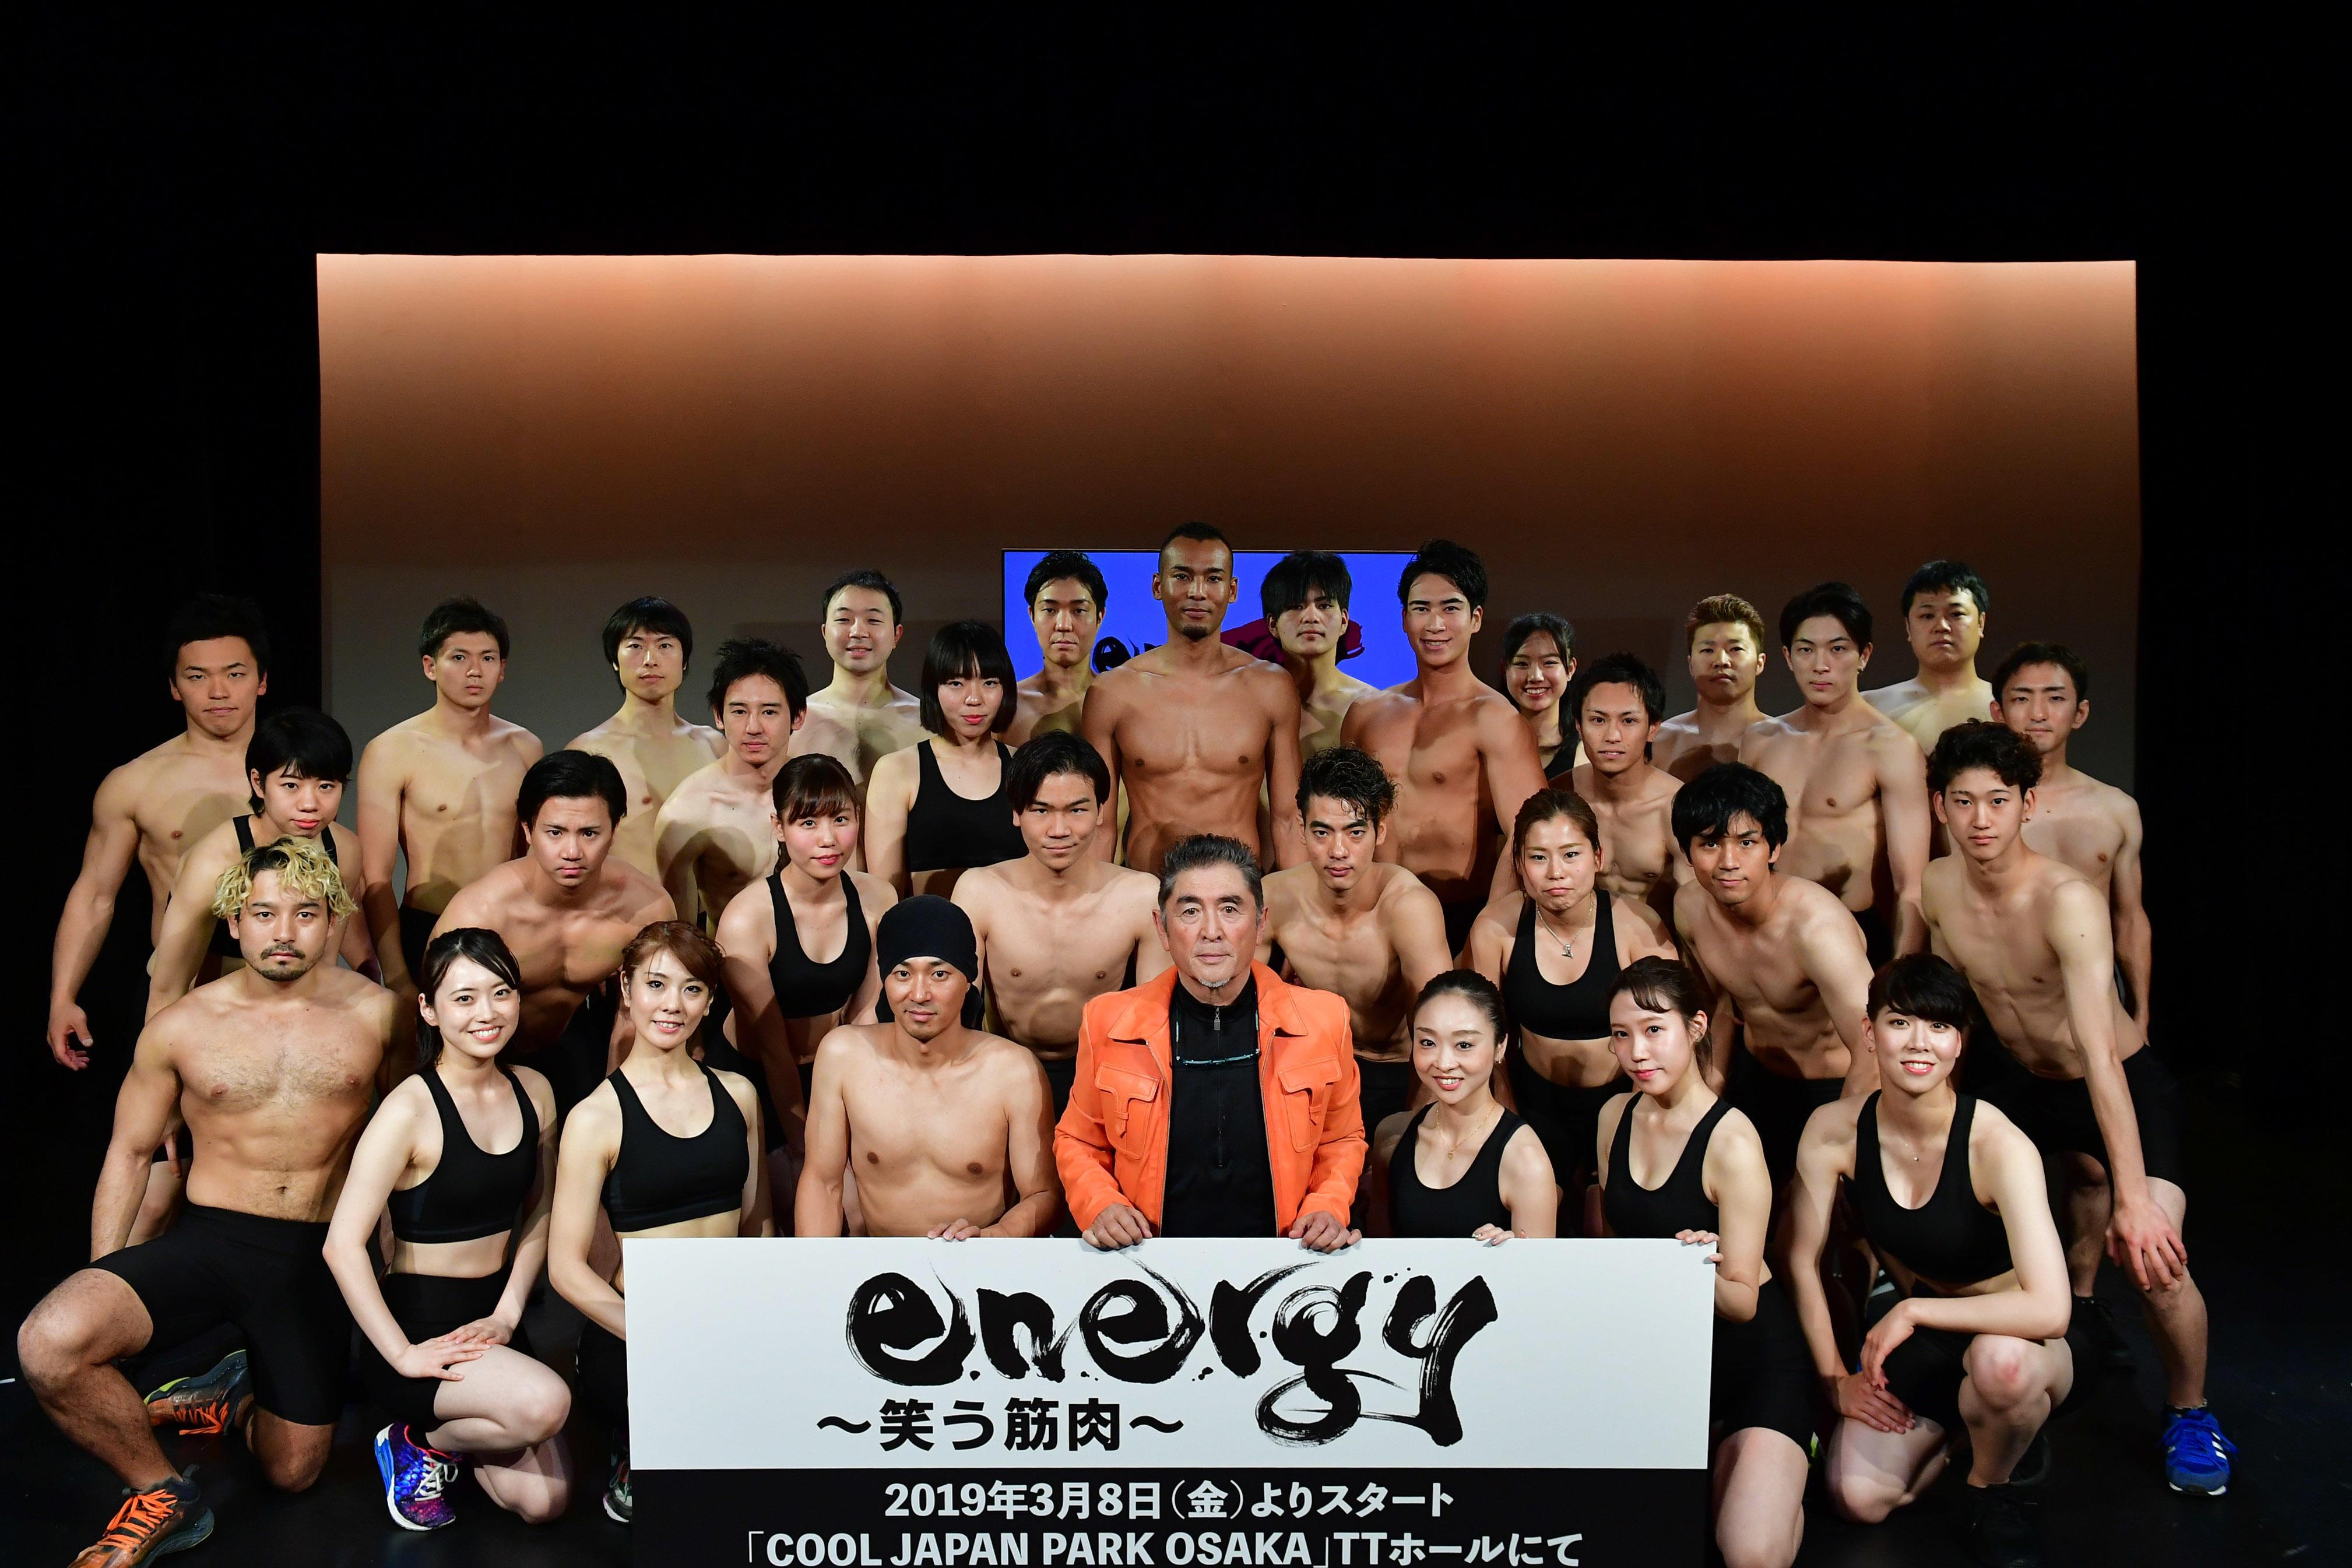 http://news.yoshimoto.co.jp/20181206205701-095d89c68f14a014f2440de468984518f6899254.jpg